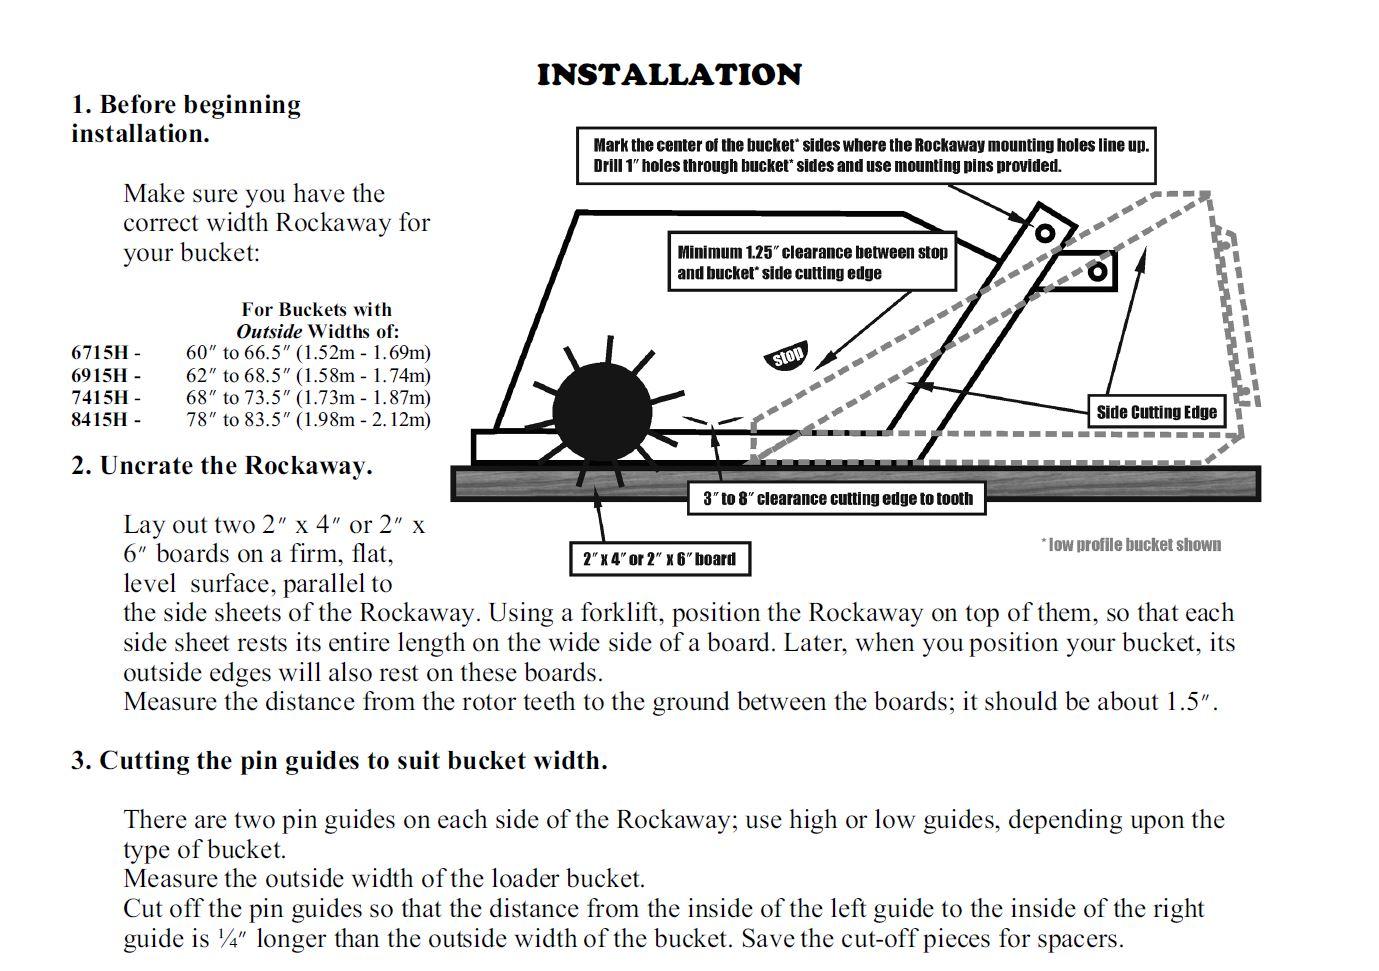 spartan-skid-steer-rock-rake-attachment-21.jpg